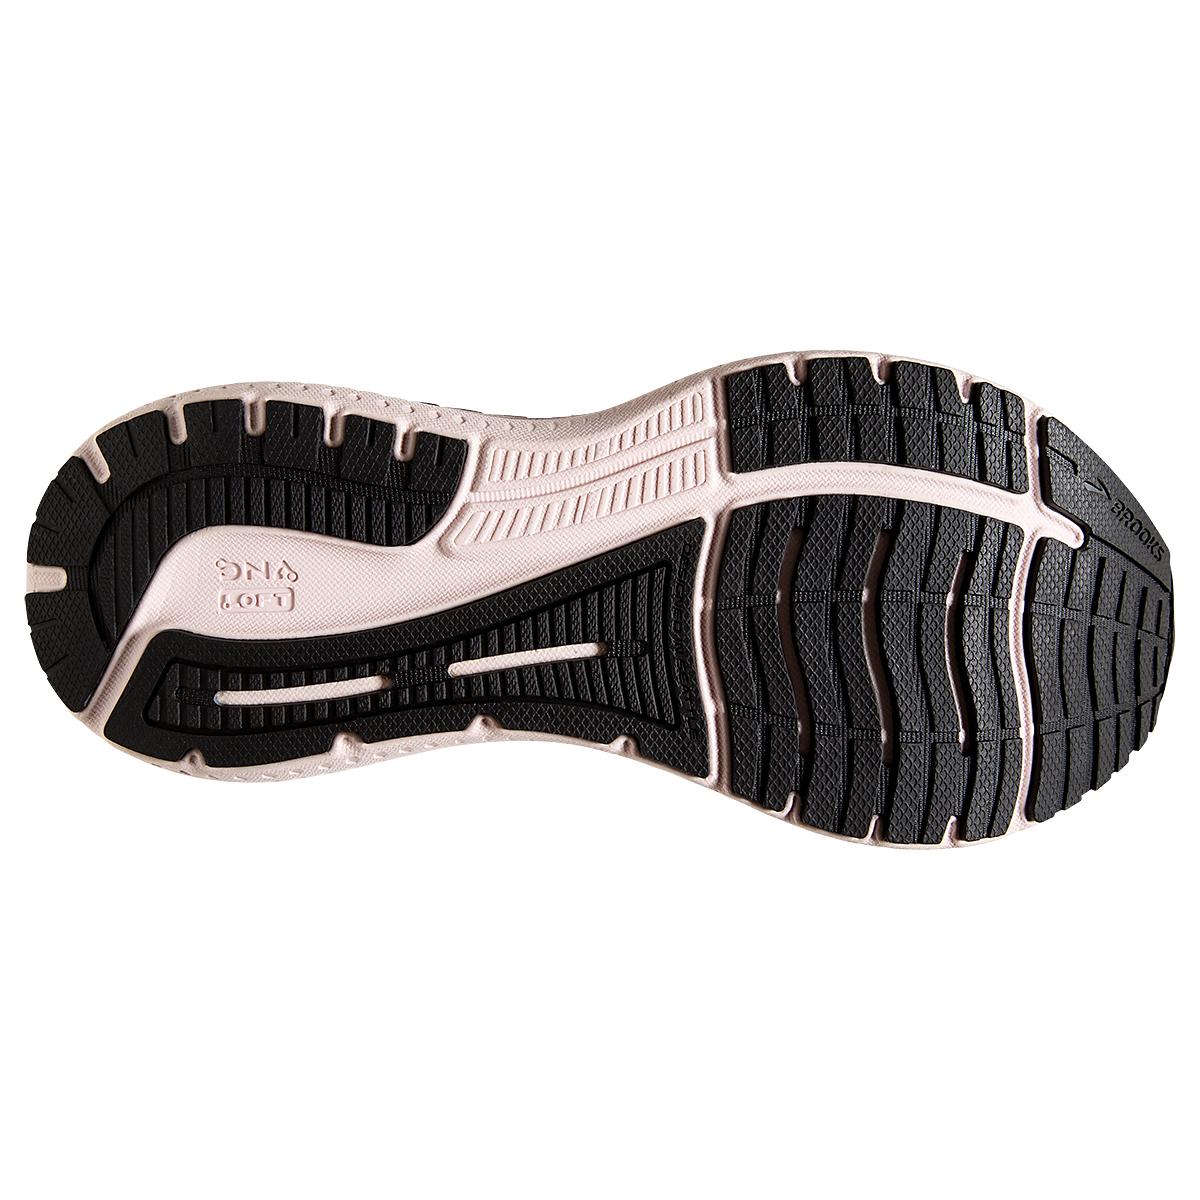 Women's Brooks Glycerin GTS 19 Running Shoe - Color: Black/Ombre/Metallic - Size: 7.5 - Width: Regular, Black/Ombre/Metallic, large, image 3